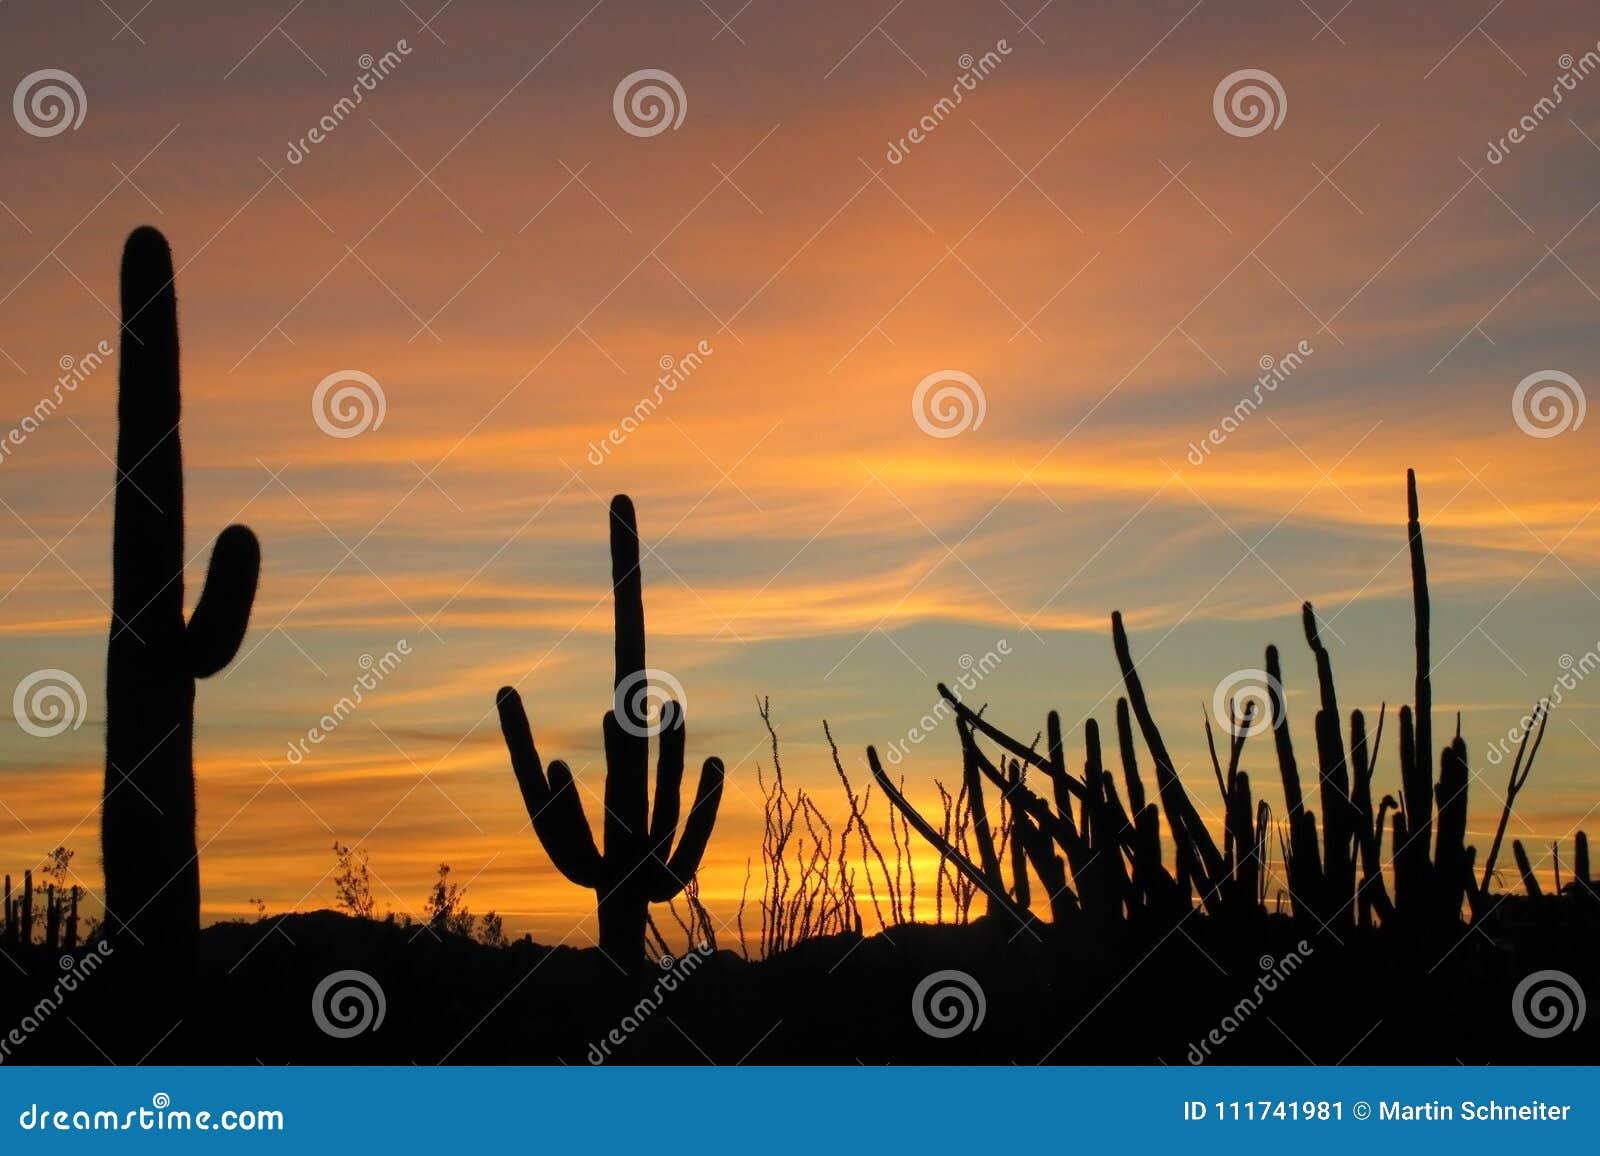 Saguaro, Organ Pipe and Ocotillo cactuses at sunset in Organ Pipe Cactus National Monument, Arizona, USA